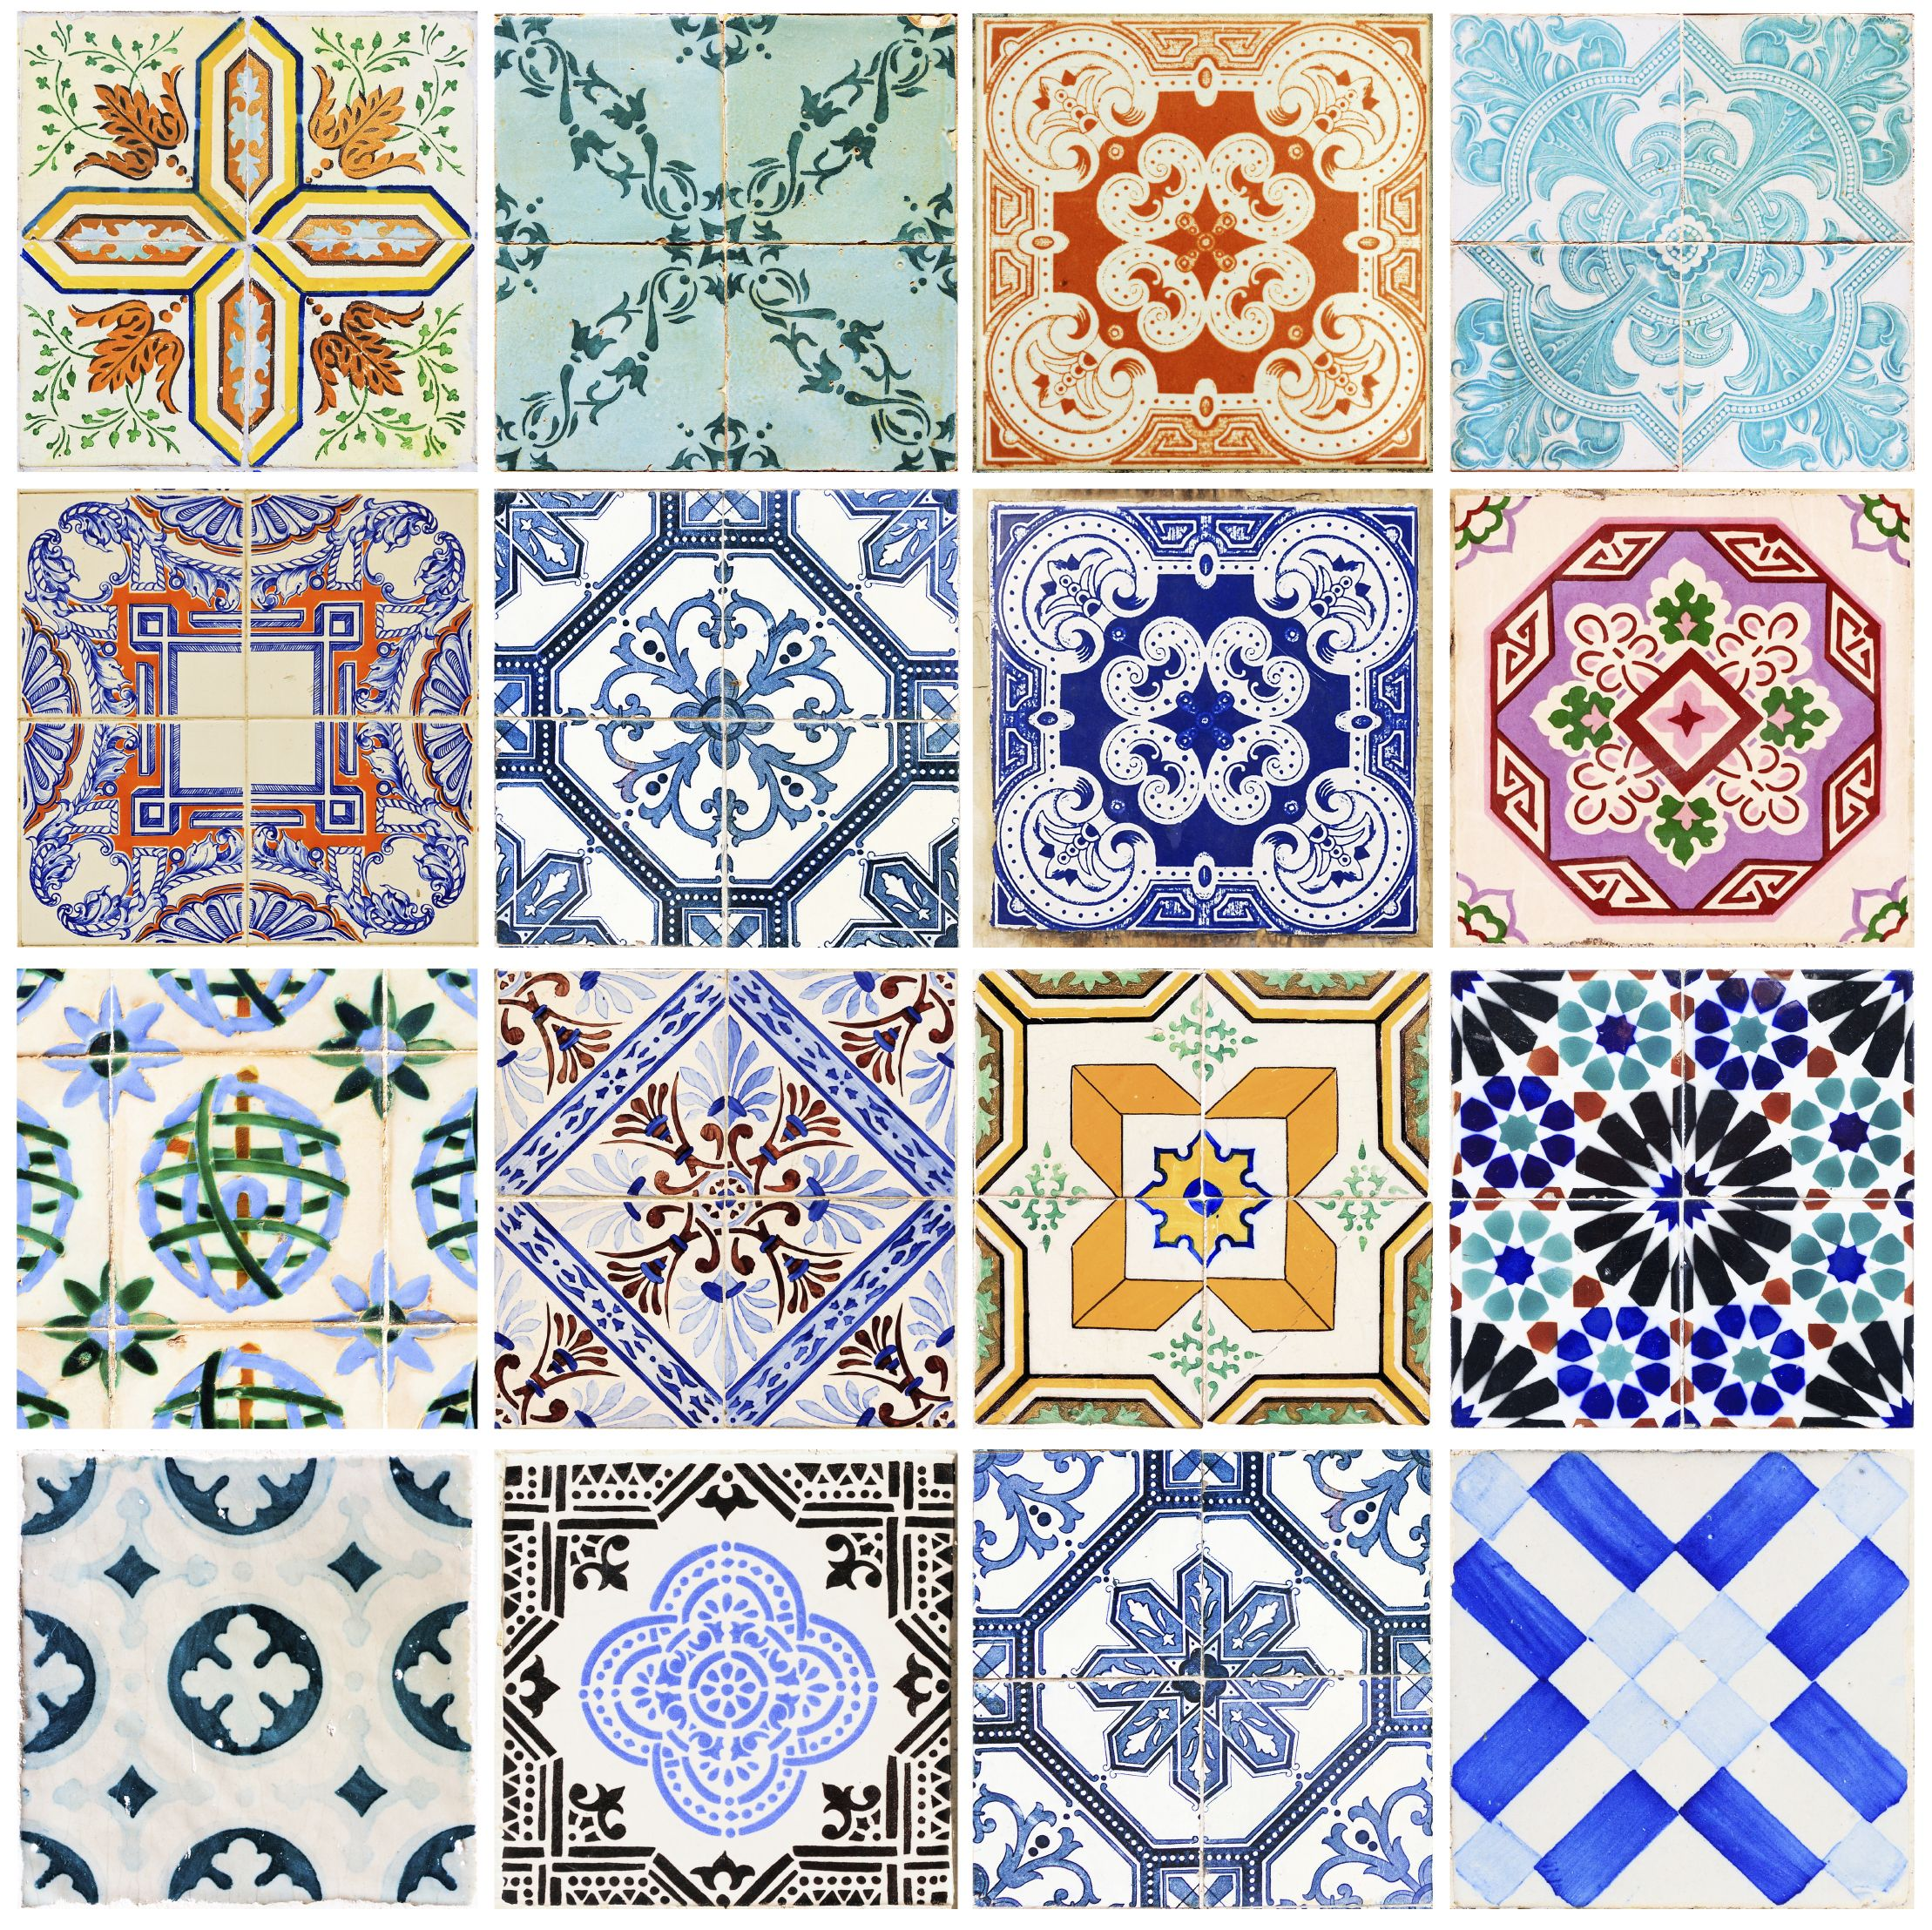 Keptalalat A Kovetkezore Turkish Hammam Pattern Sticker Decor Tile Decals Spanish Tile